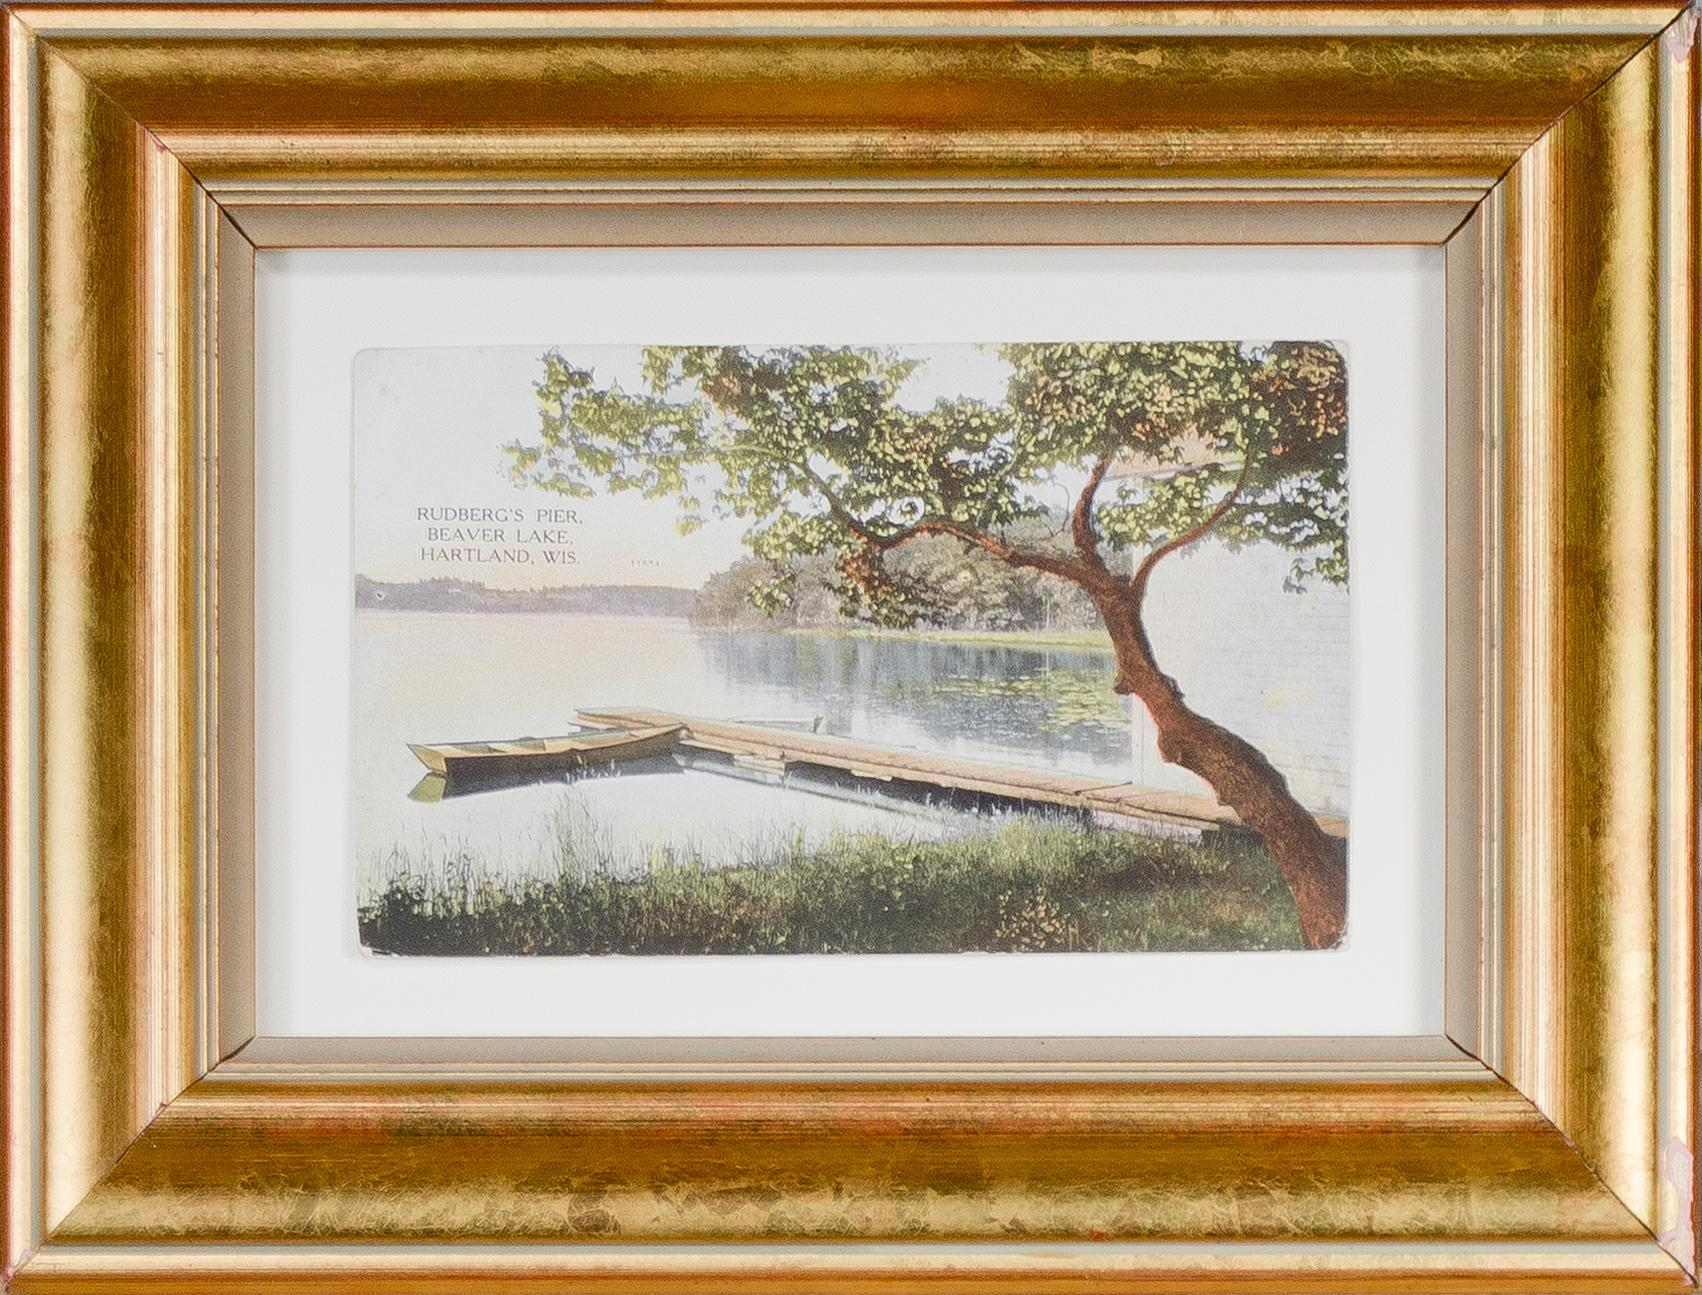 Postcard with view of Rudberg's Pier, Beaver Lake, Hartland, Wisconsin